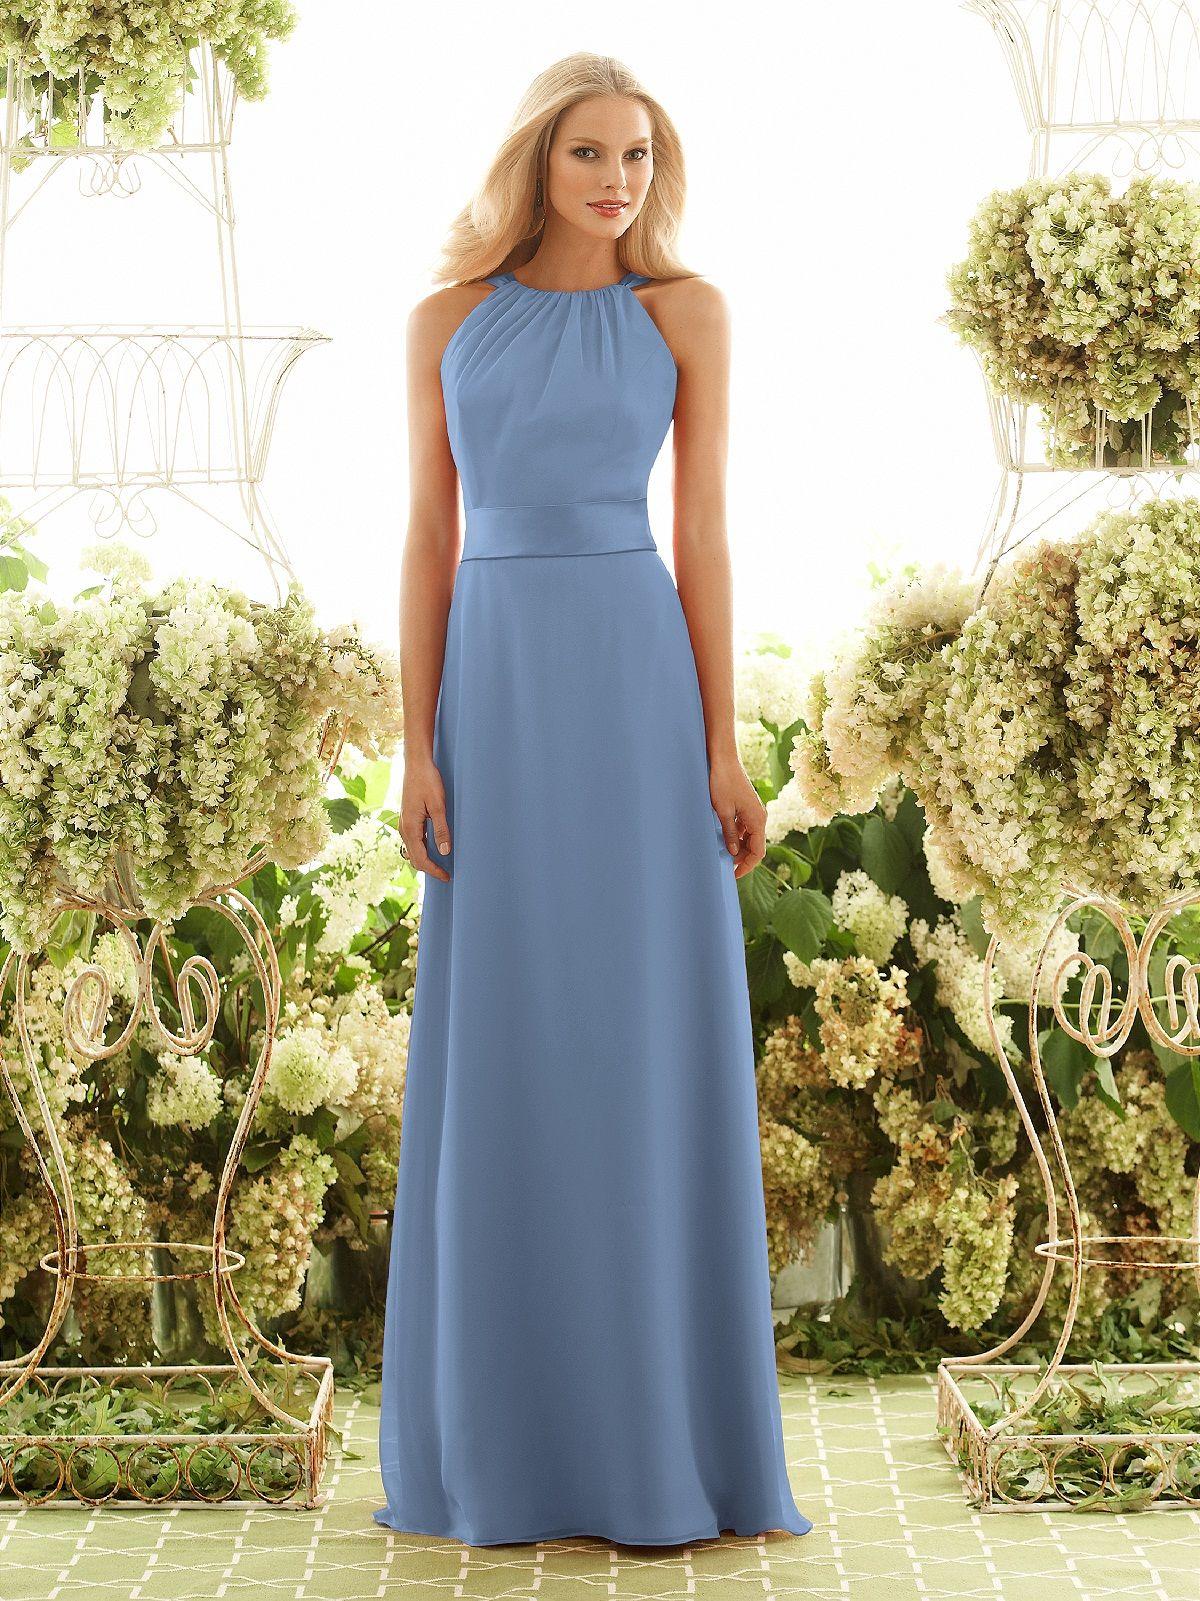 Windsor blue bm dress wedding ideas pinterest windsor fc and